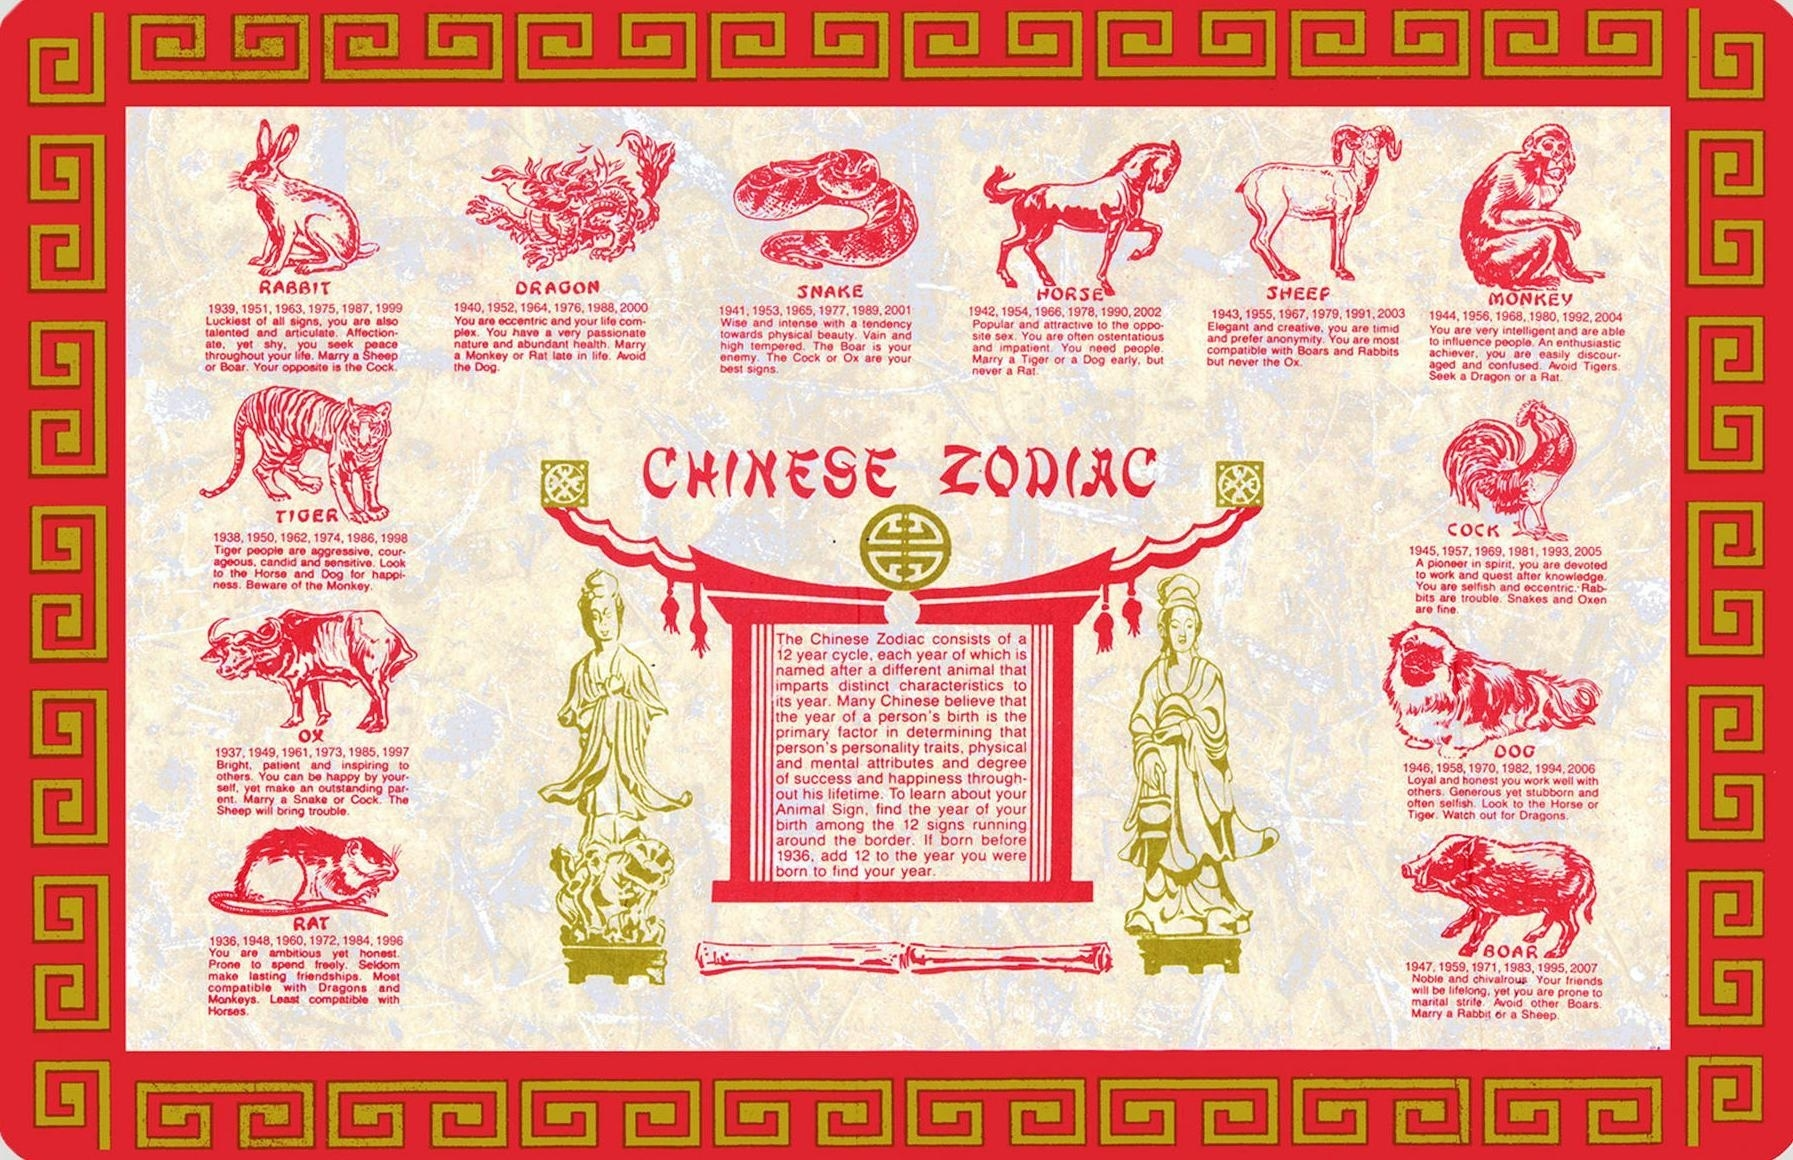 The Chinese Zodiac Calendar | The Chinese Quest Lunar New Year Zodiac Calendar